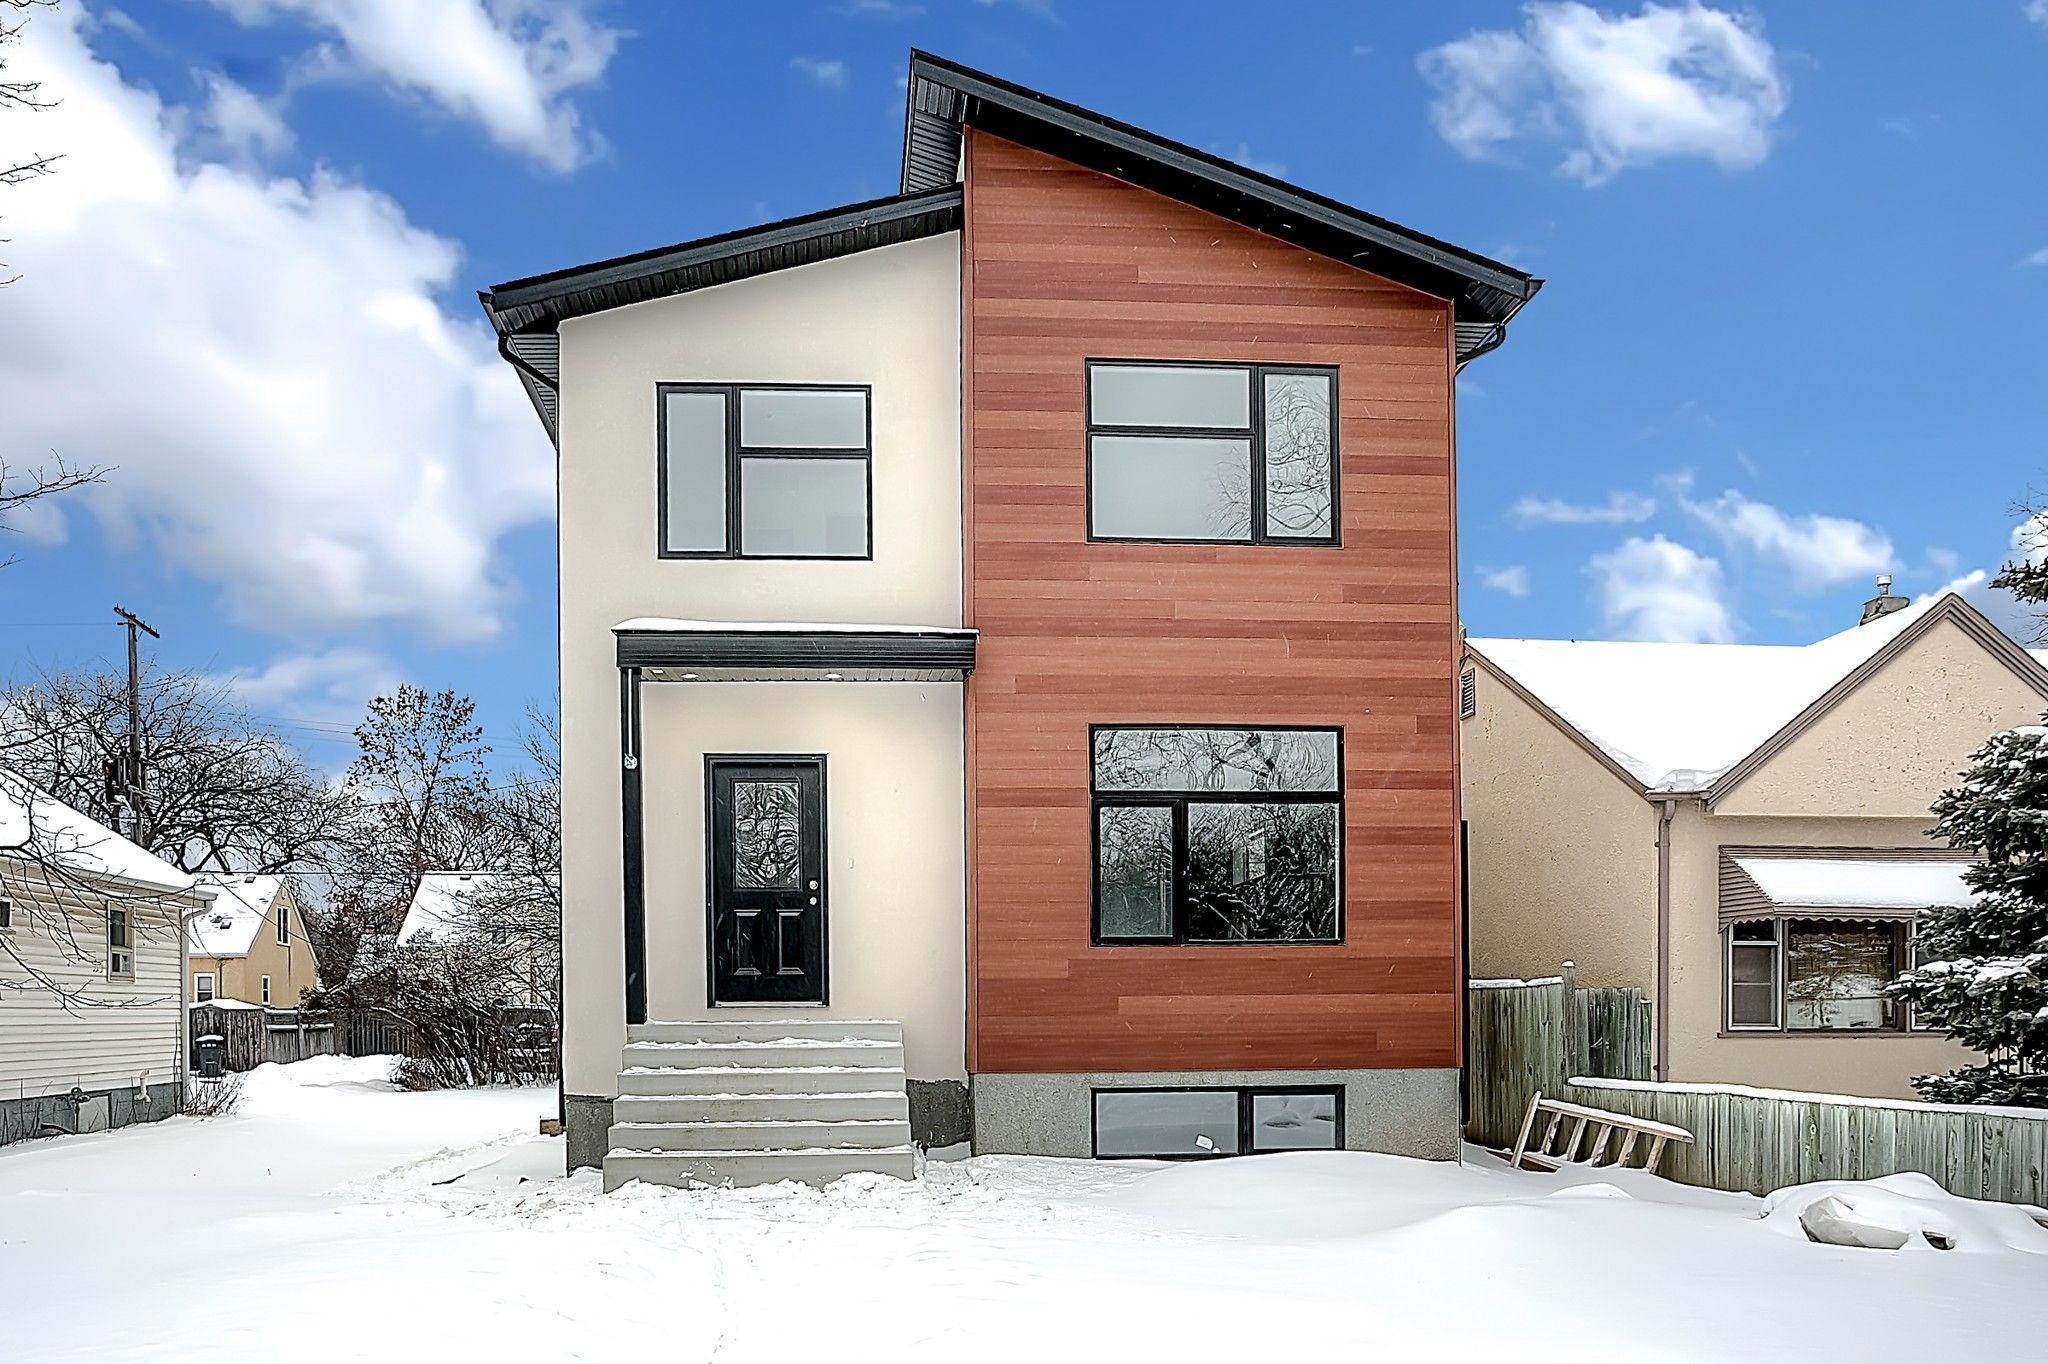 Main Photo: 955 Fleet Avenue in Winnipeg: Crescentwood Single Family Detached for sale (1B)  : MLS®# 202001513